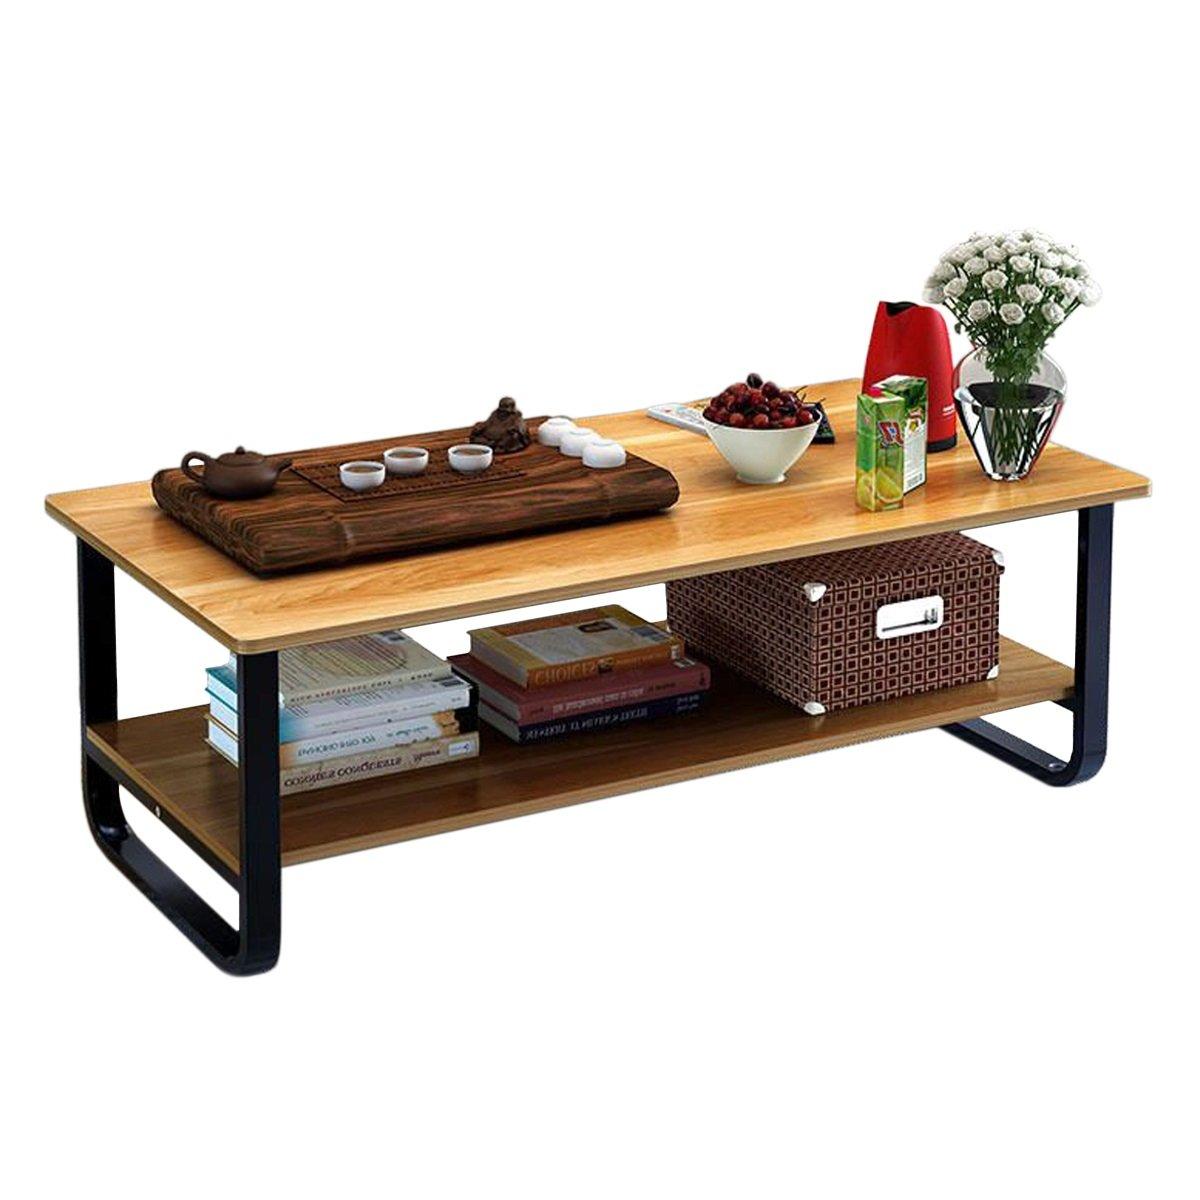 Rectangular Coffee/Tea Table with Storage Shelf (Wood)